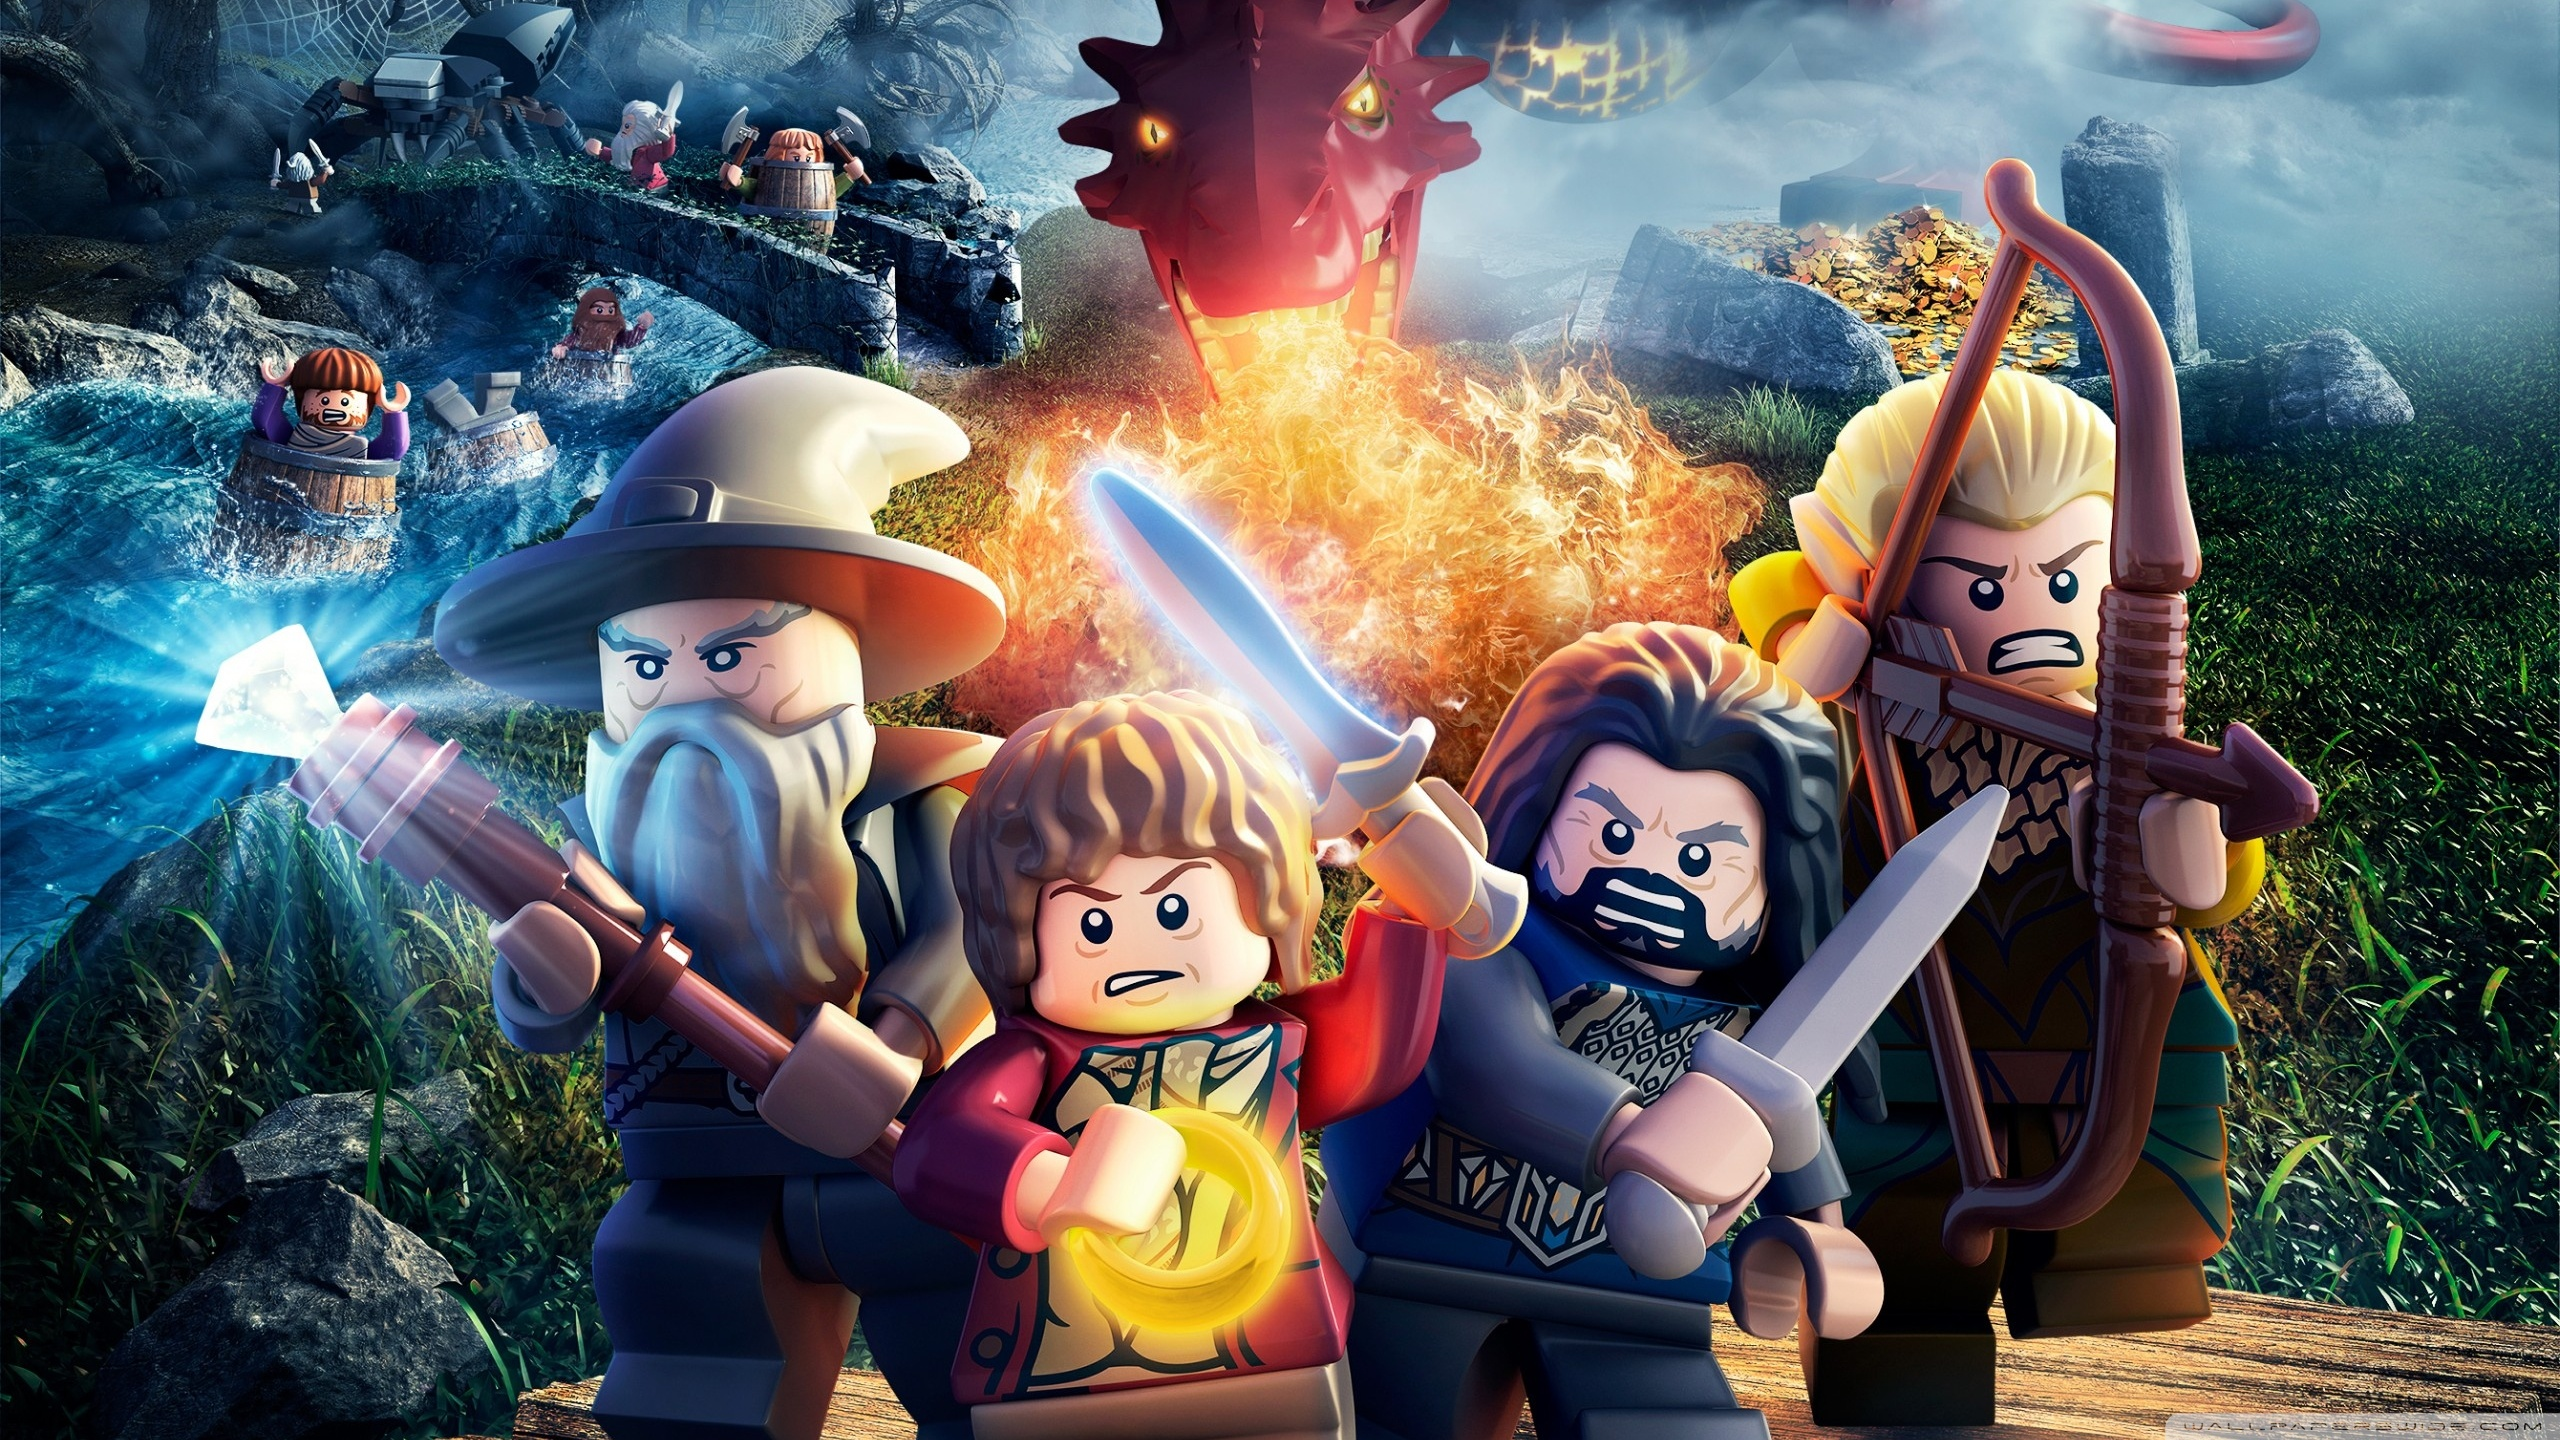 lego the hobbit 2014 video game wallpaper 2560x1440 Wallpaper 4K 2560x1440